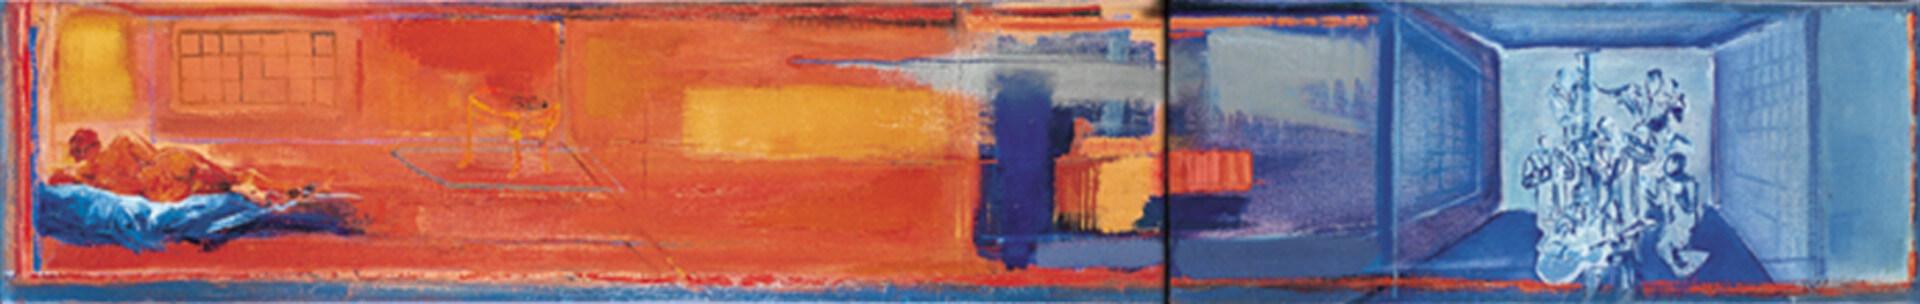 2005 - Oil on canvas. 30 cm. x 200 cm.